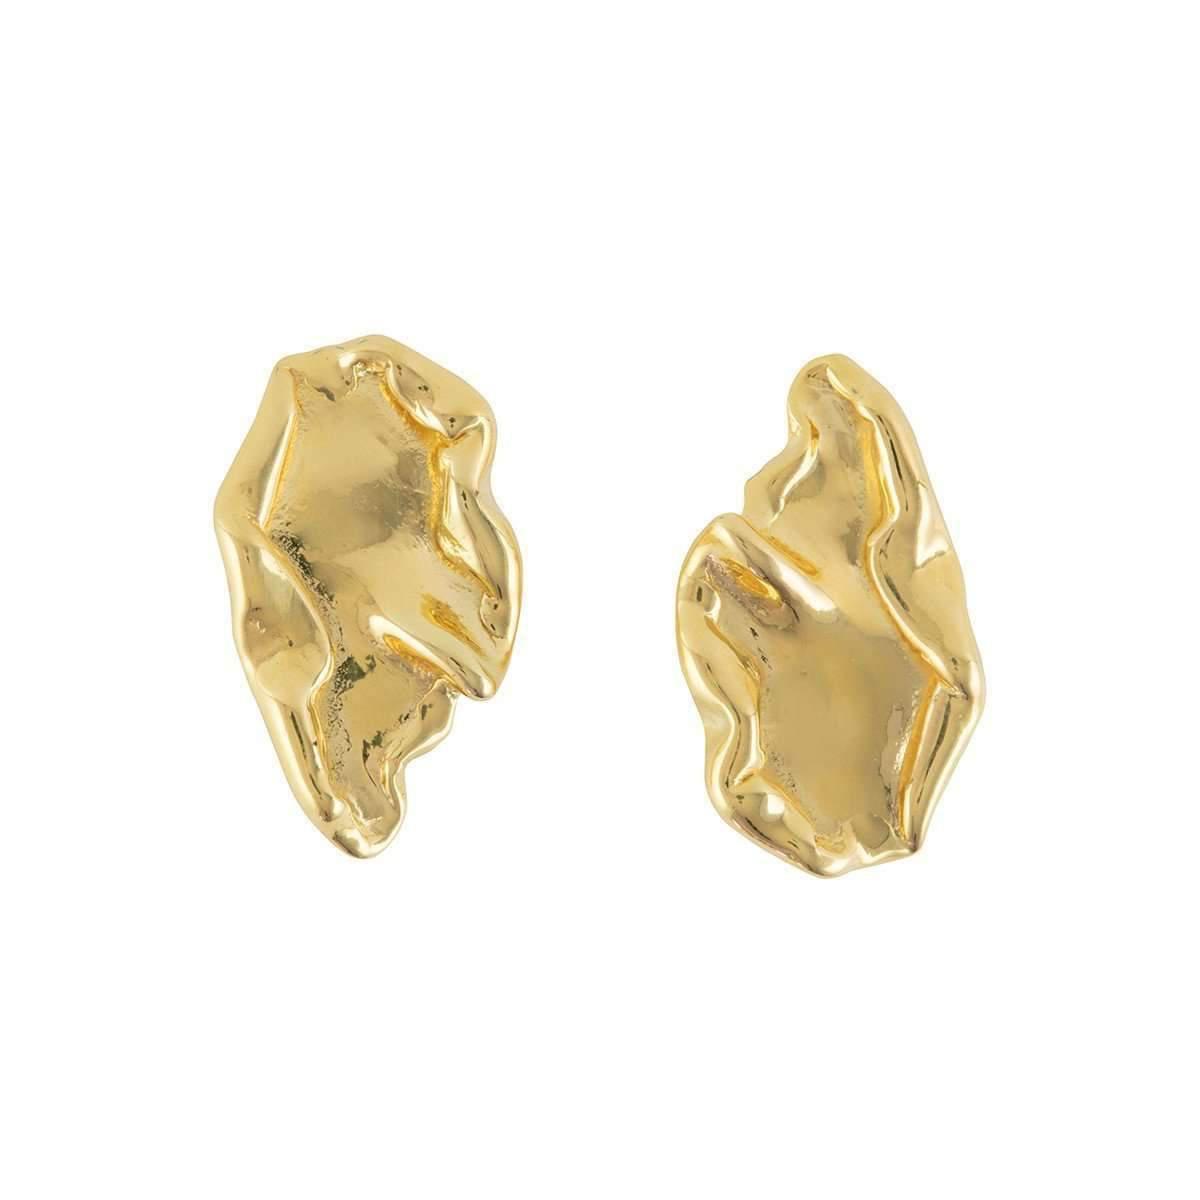 Deborah Blyth Jewellery Silver Arva Pearl Earrings ClBjDaWoCi